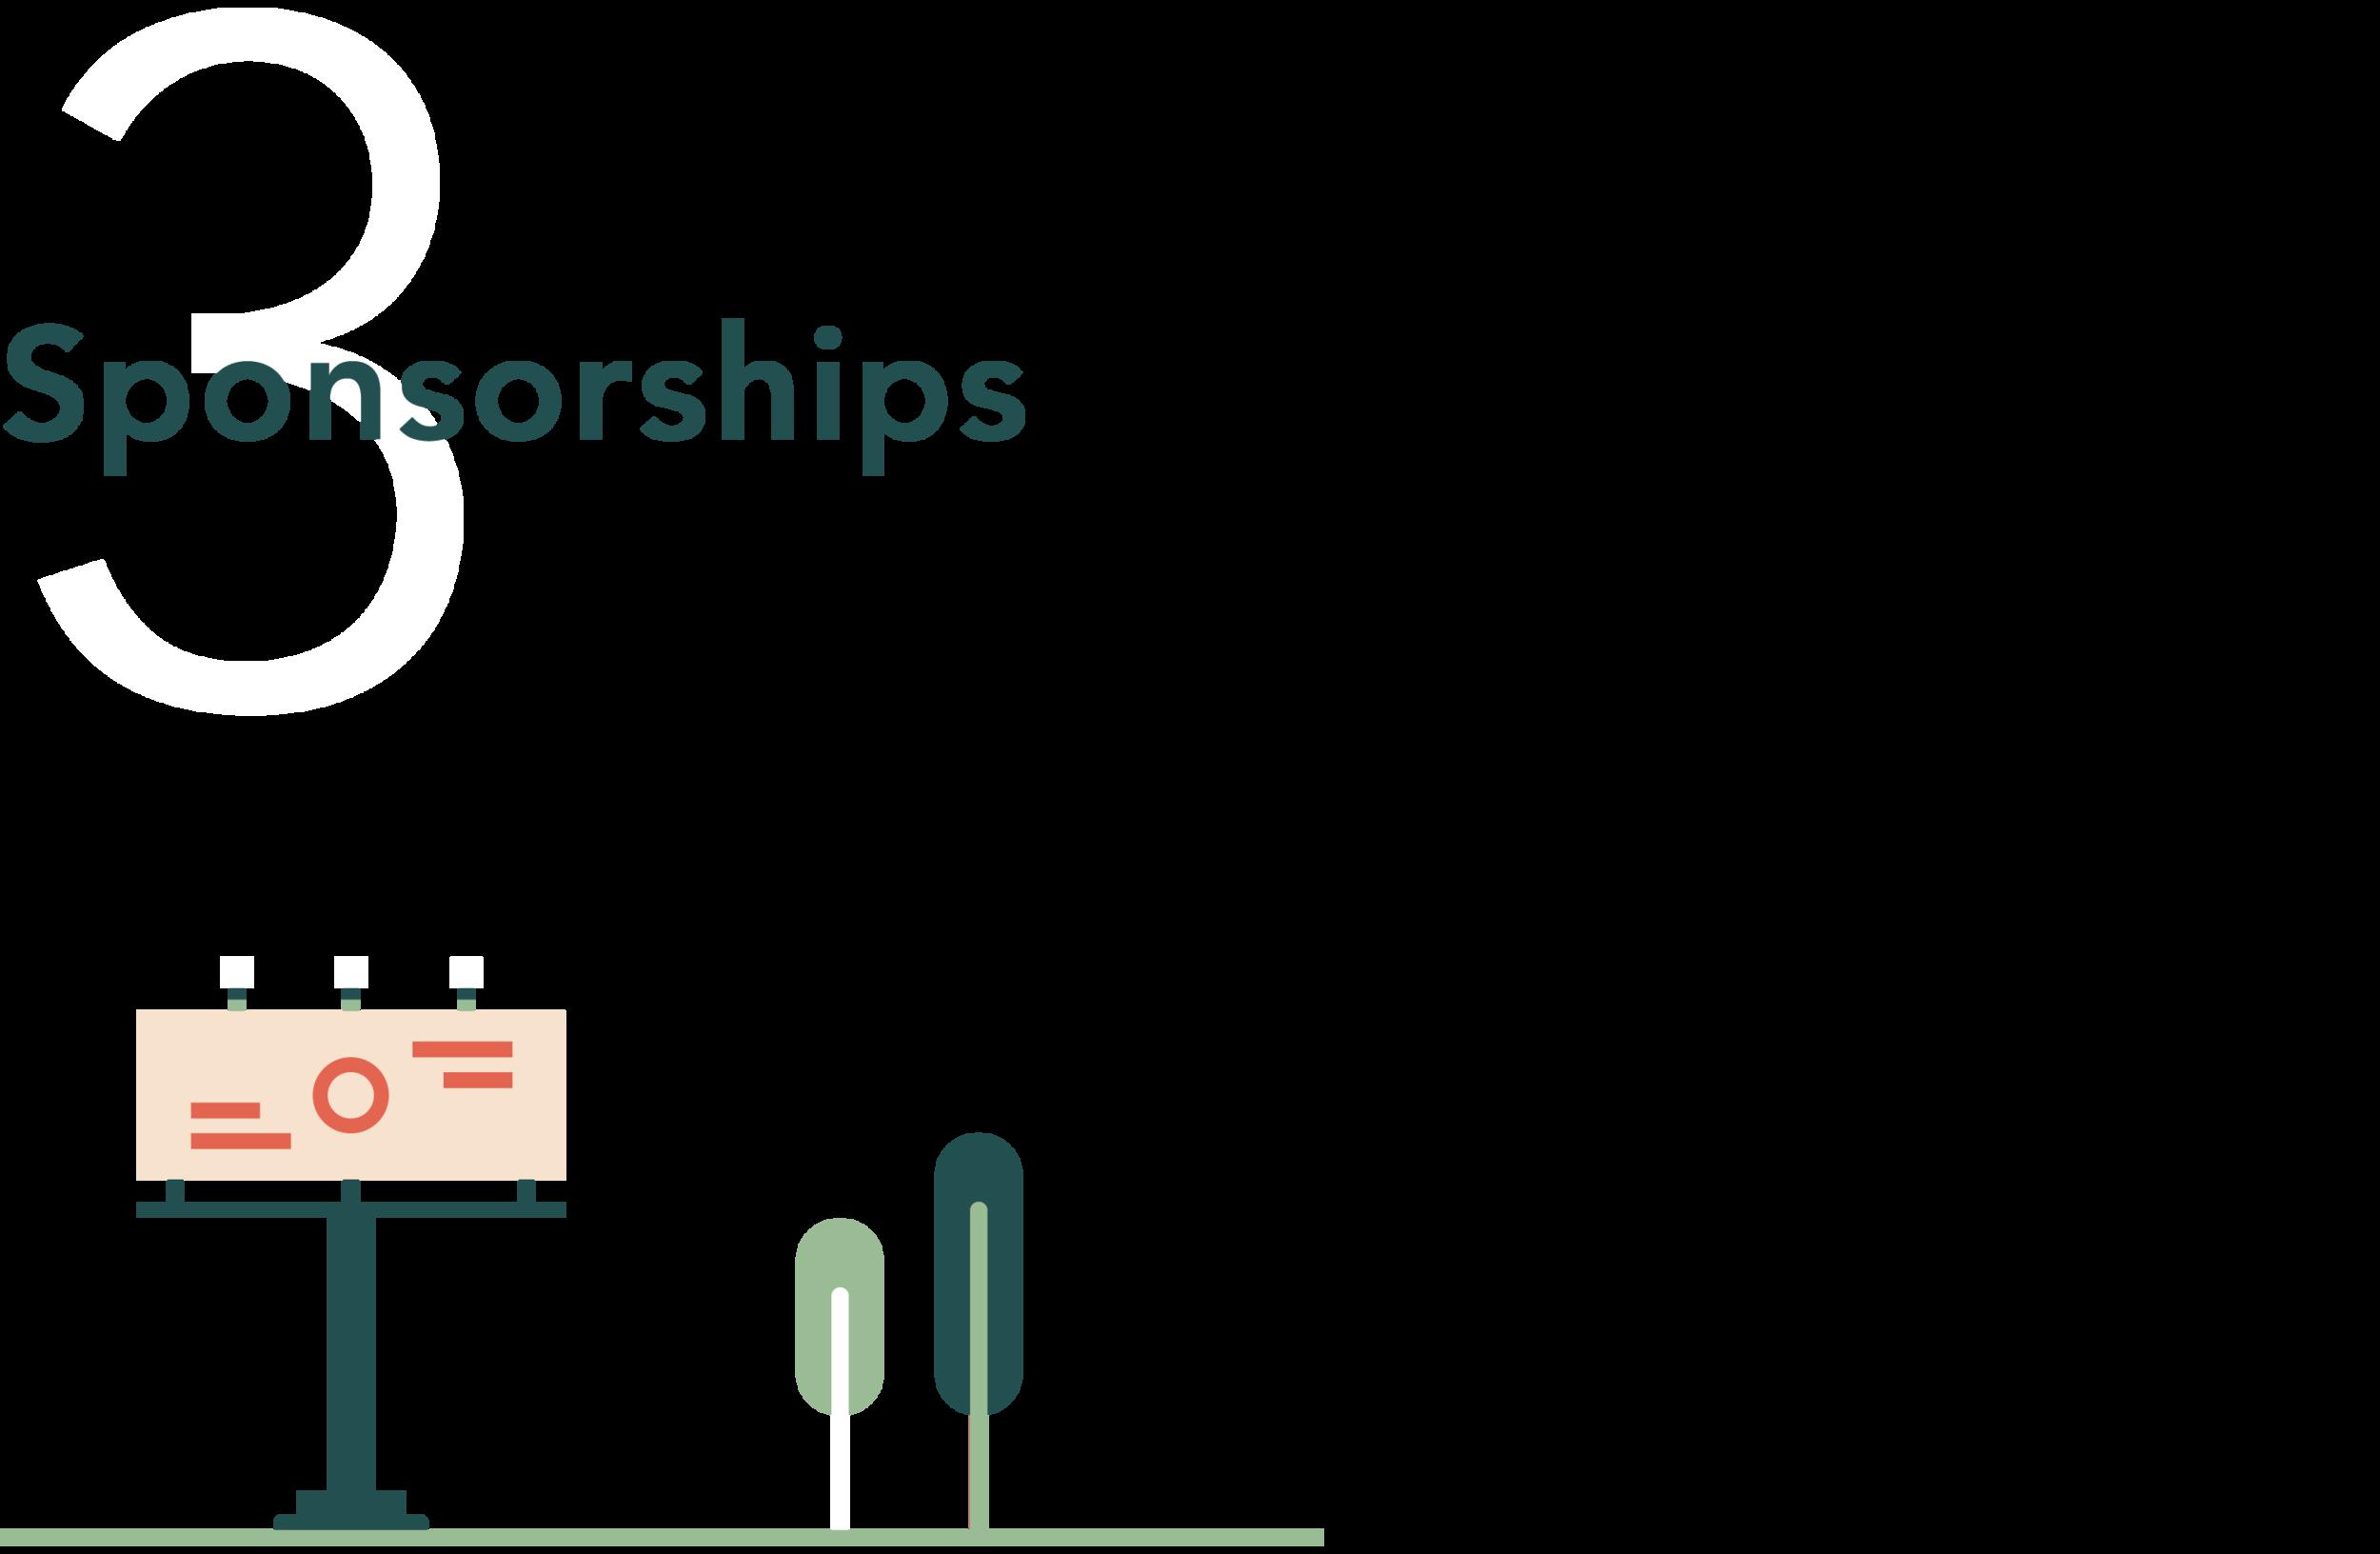 Home_Sponsorships.png